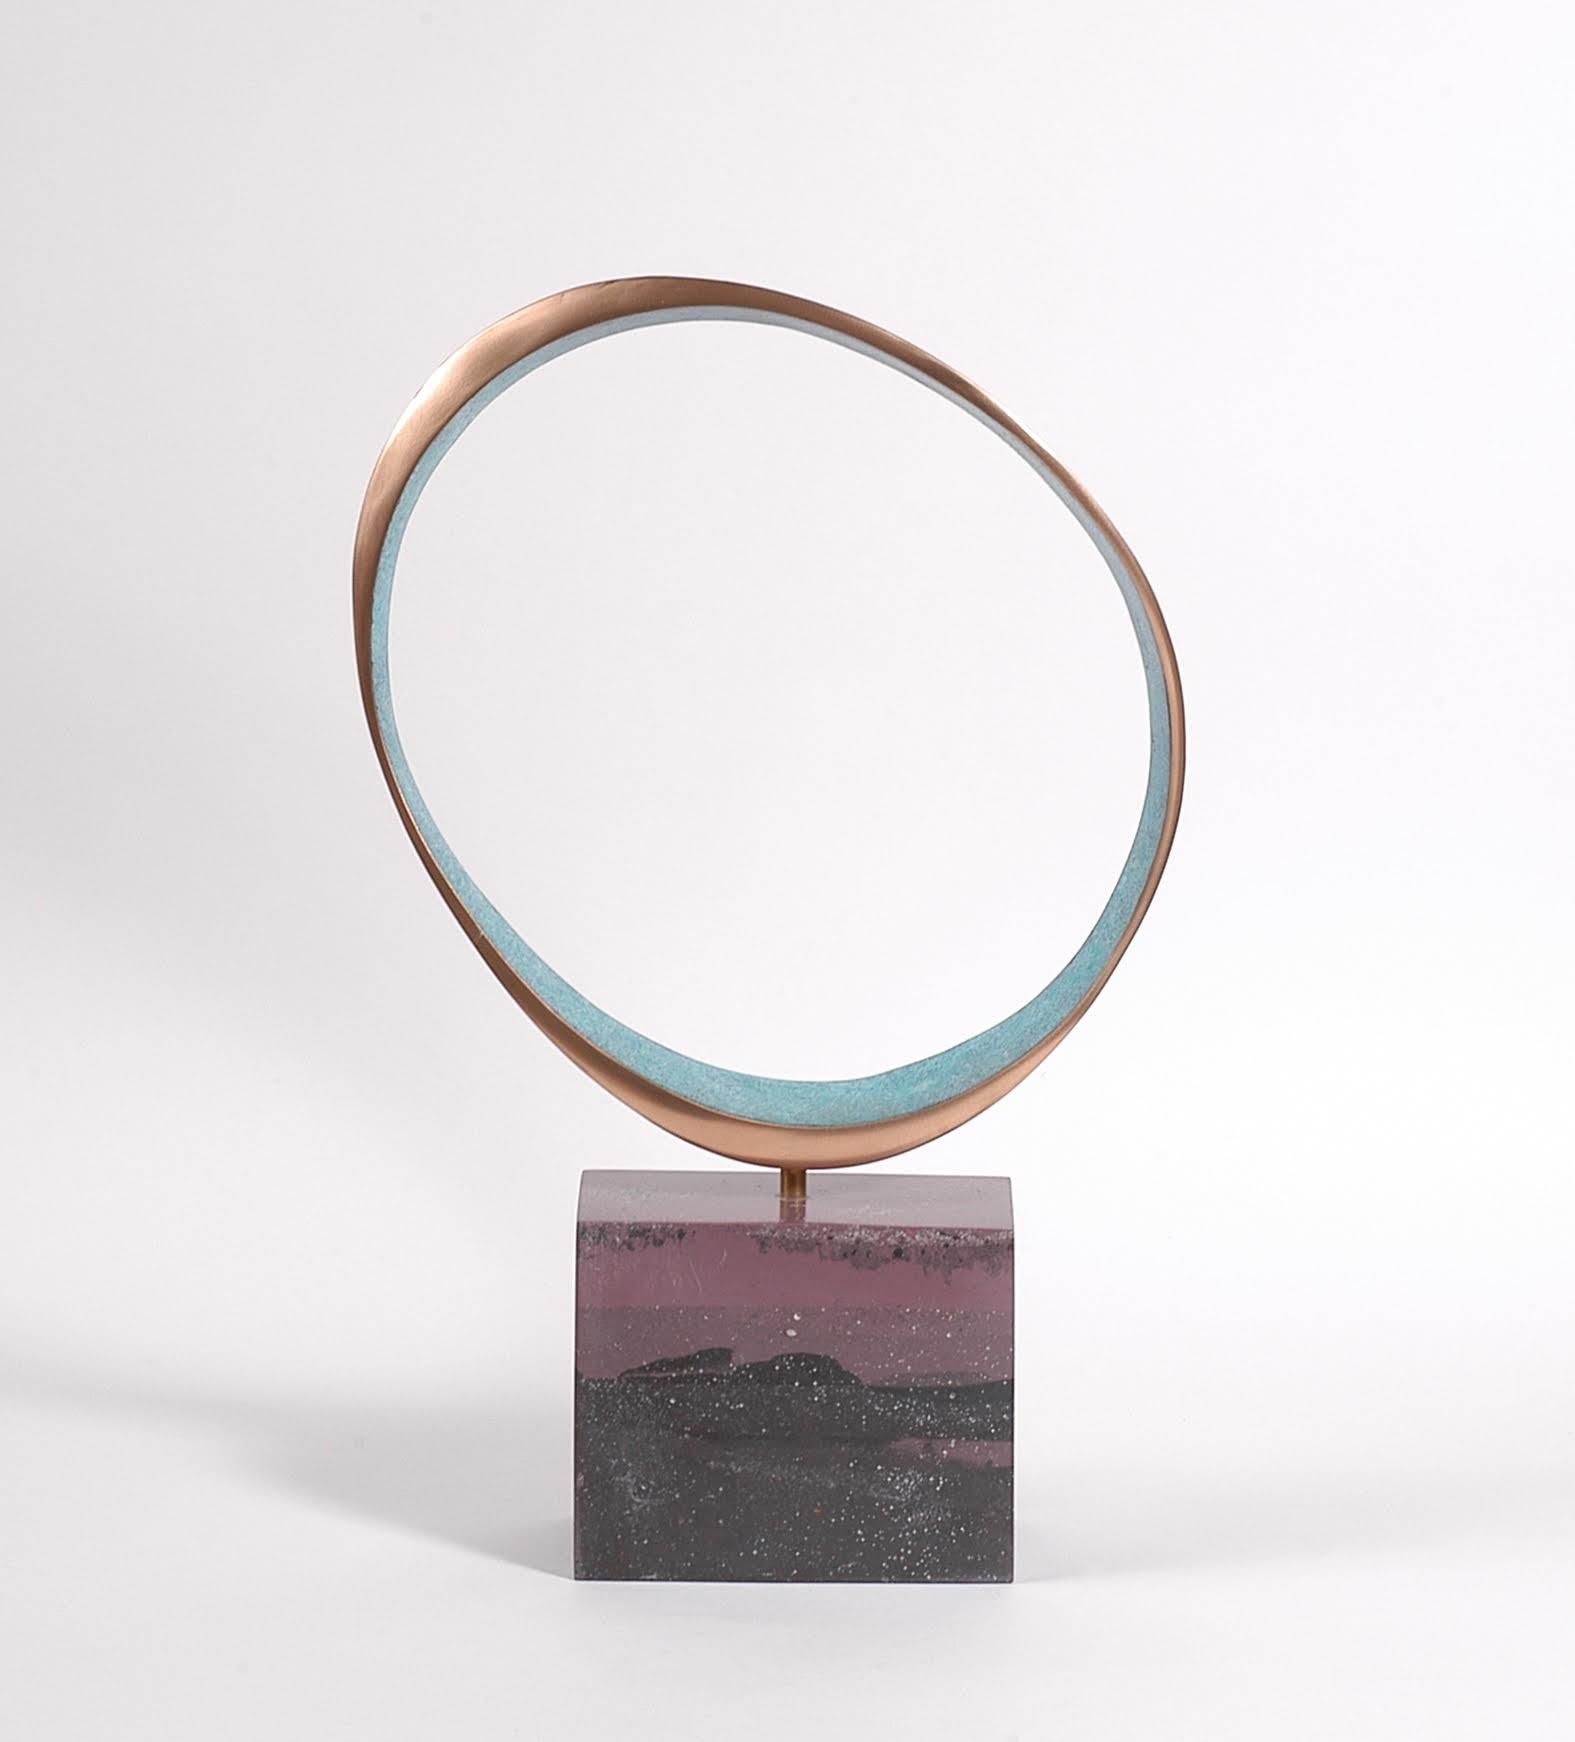 Philip Hearsey, Always, 2019, £1,500, HK$15,266, bronze, limited edition of 9, Wychwood Art